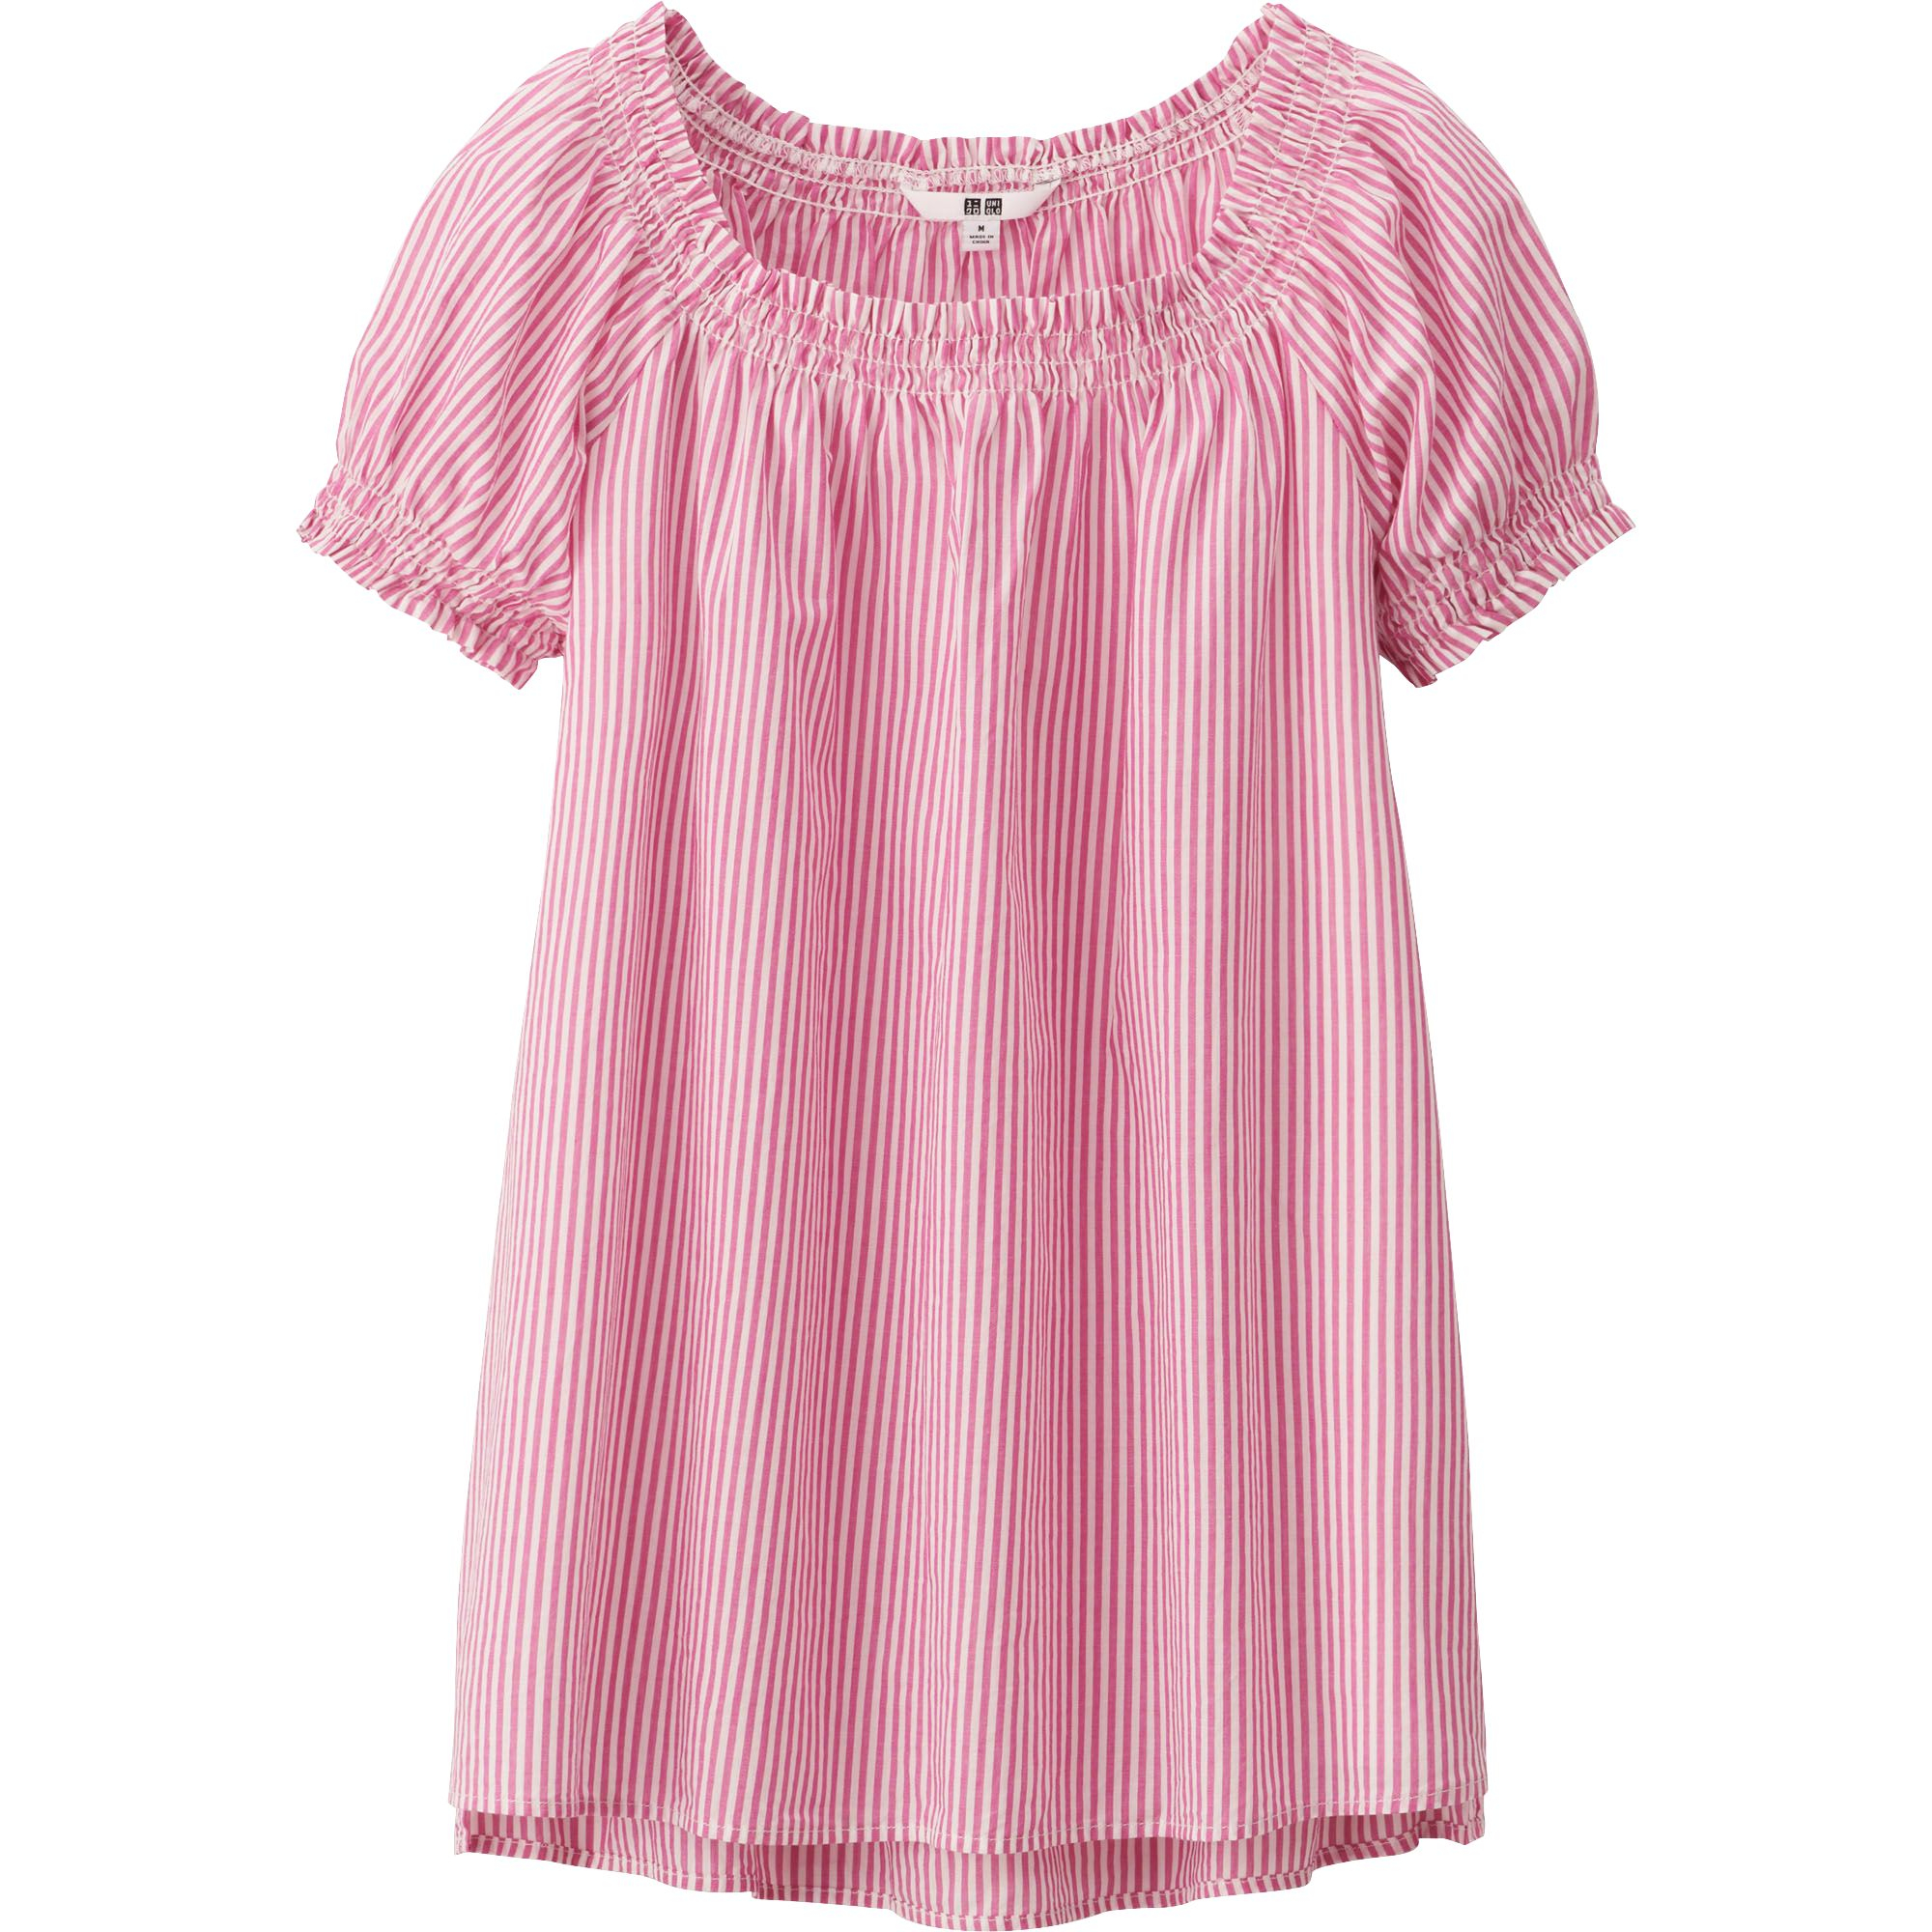 Plus Size Bodycon Dresses; Plus Size Maxi Dresses; Plus Size Beachwear Free Delivery· Cheap Fashion· Latest Styles· Factory Price.